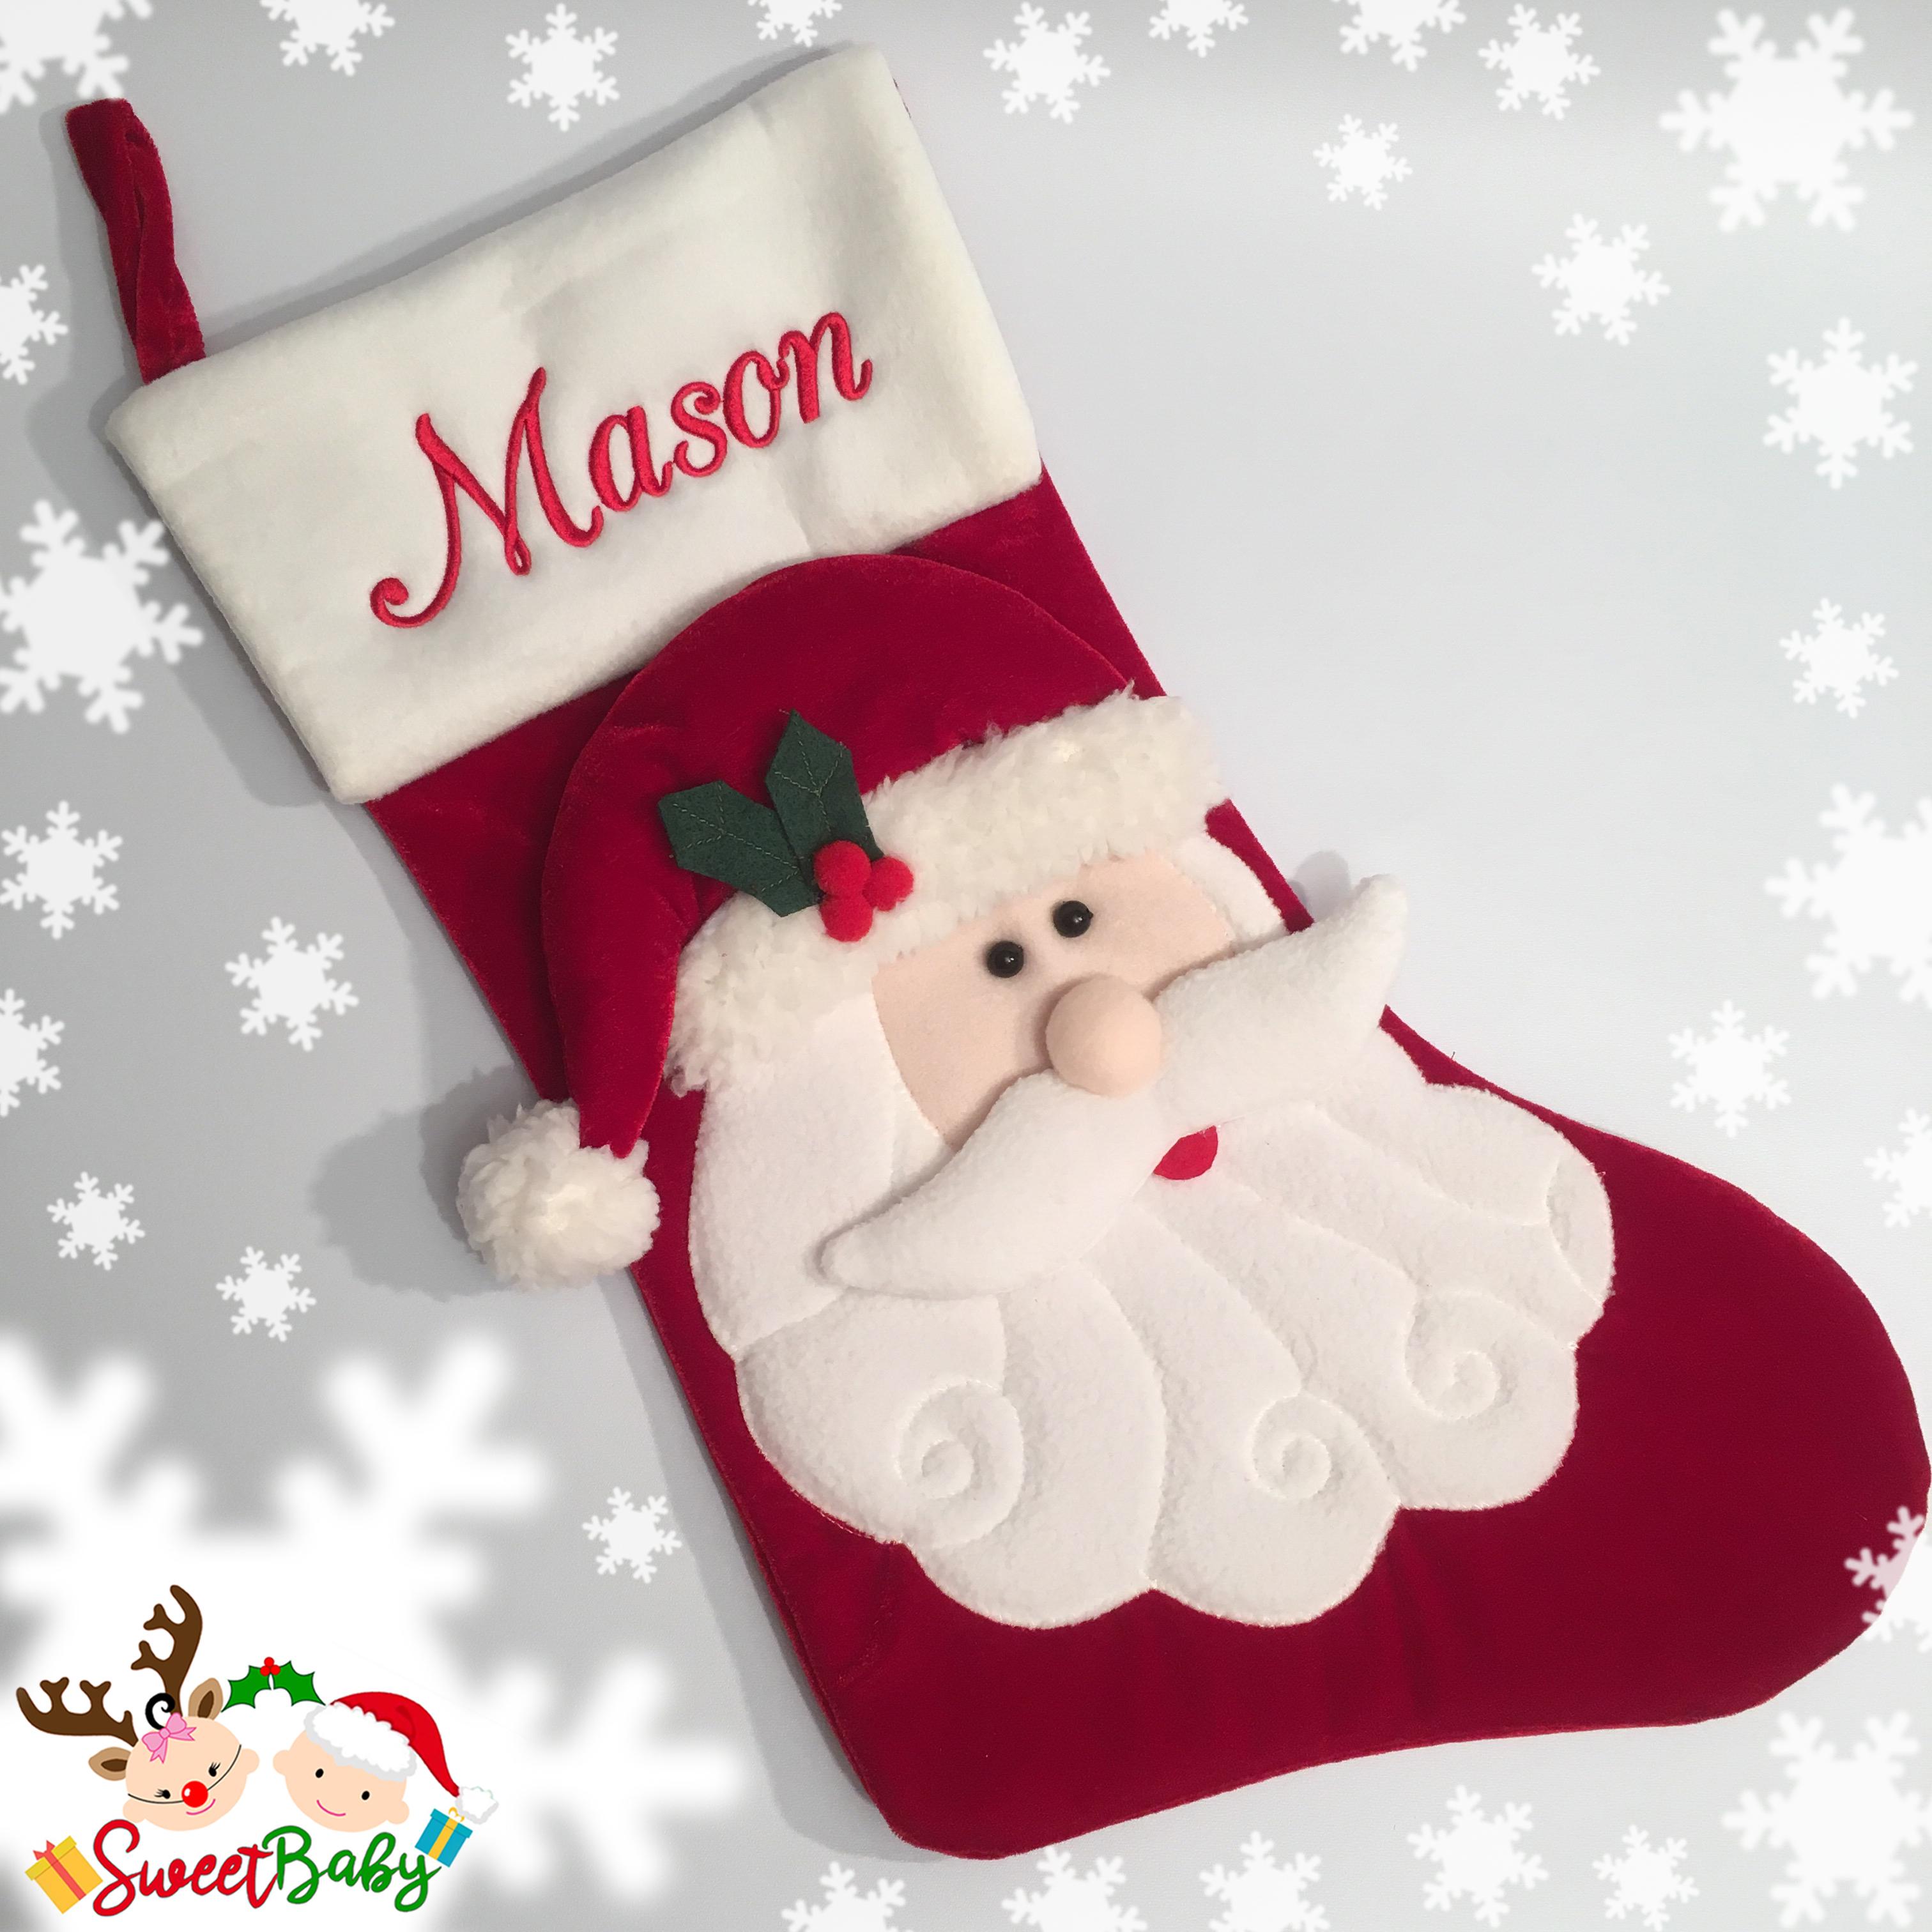 Personalised Santa Claus Stocking